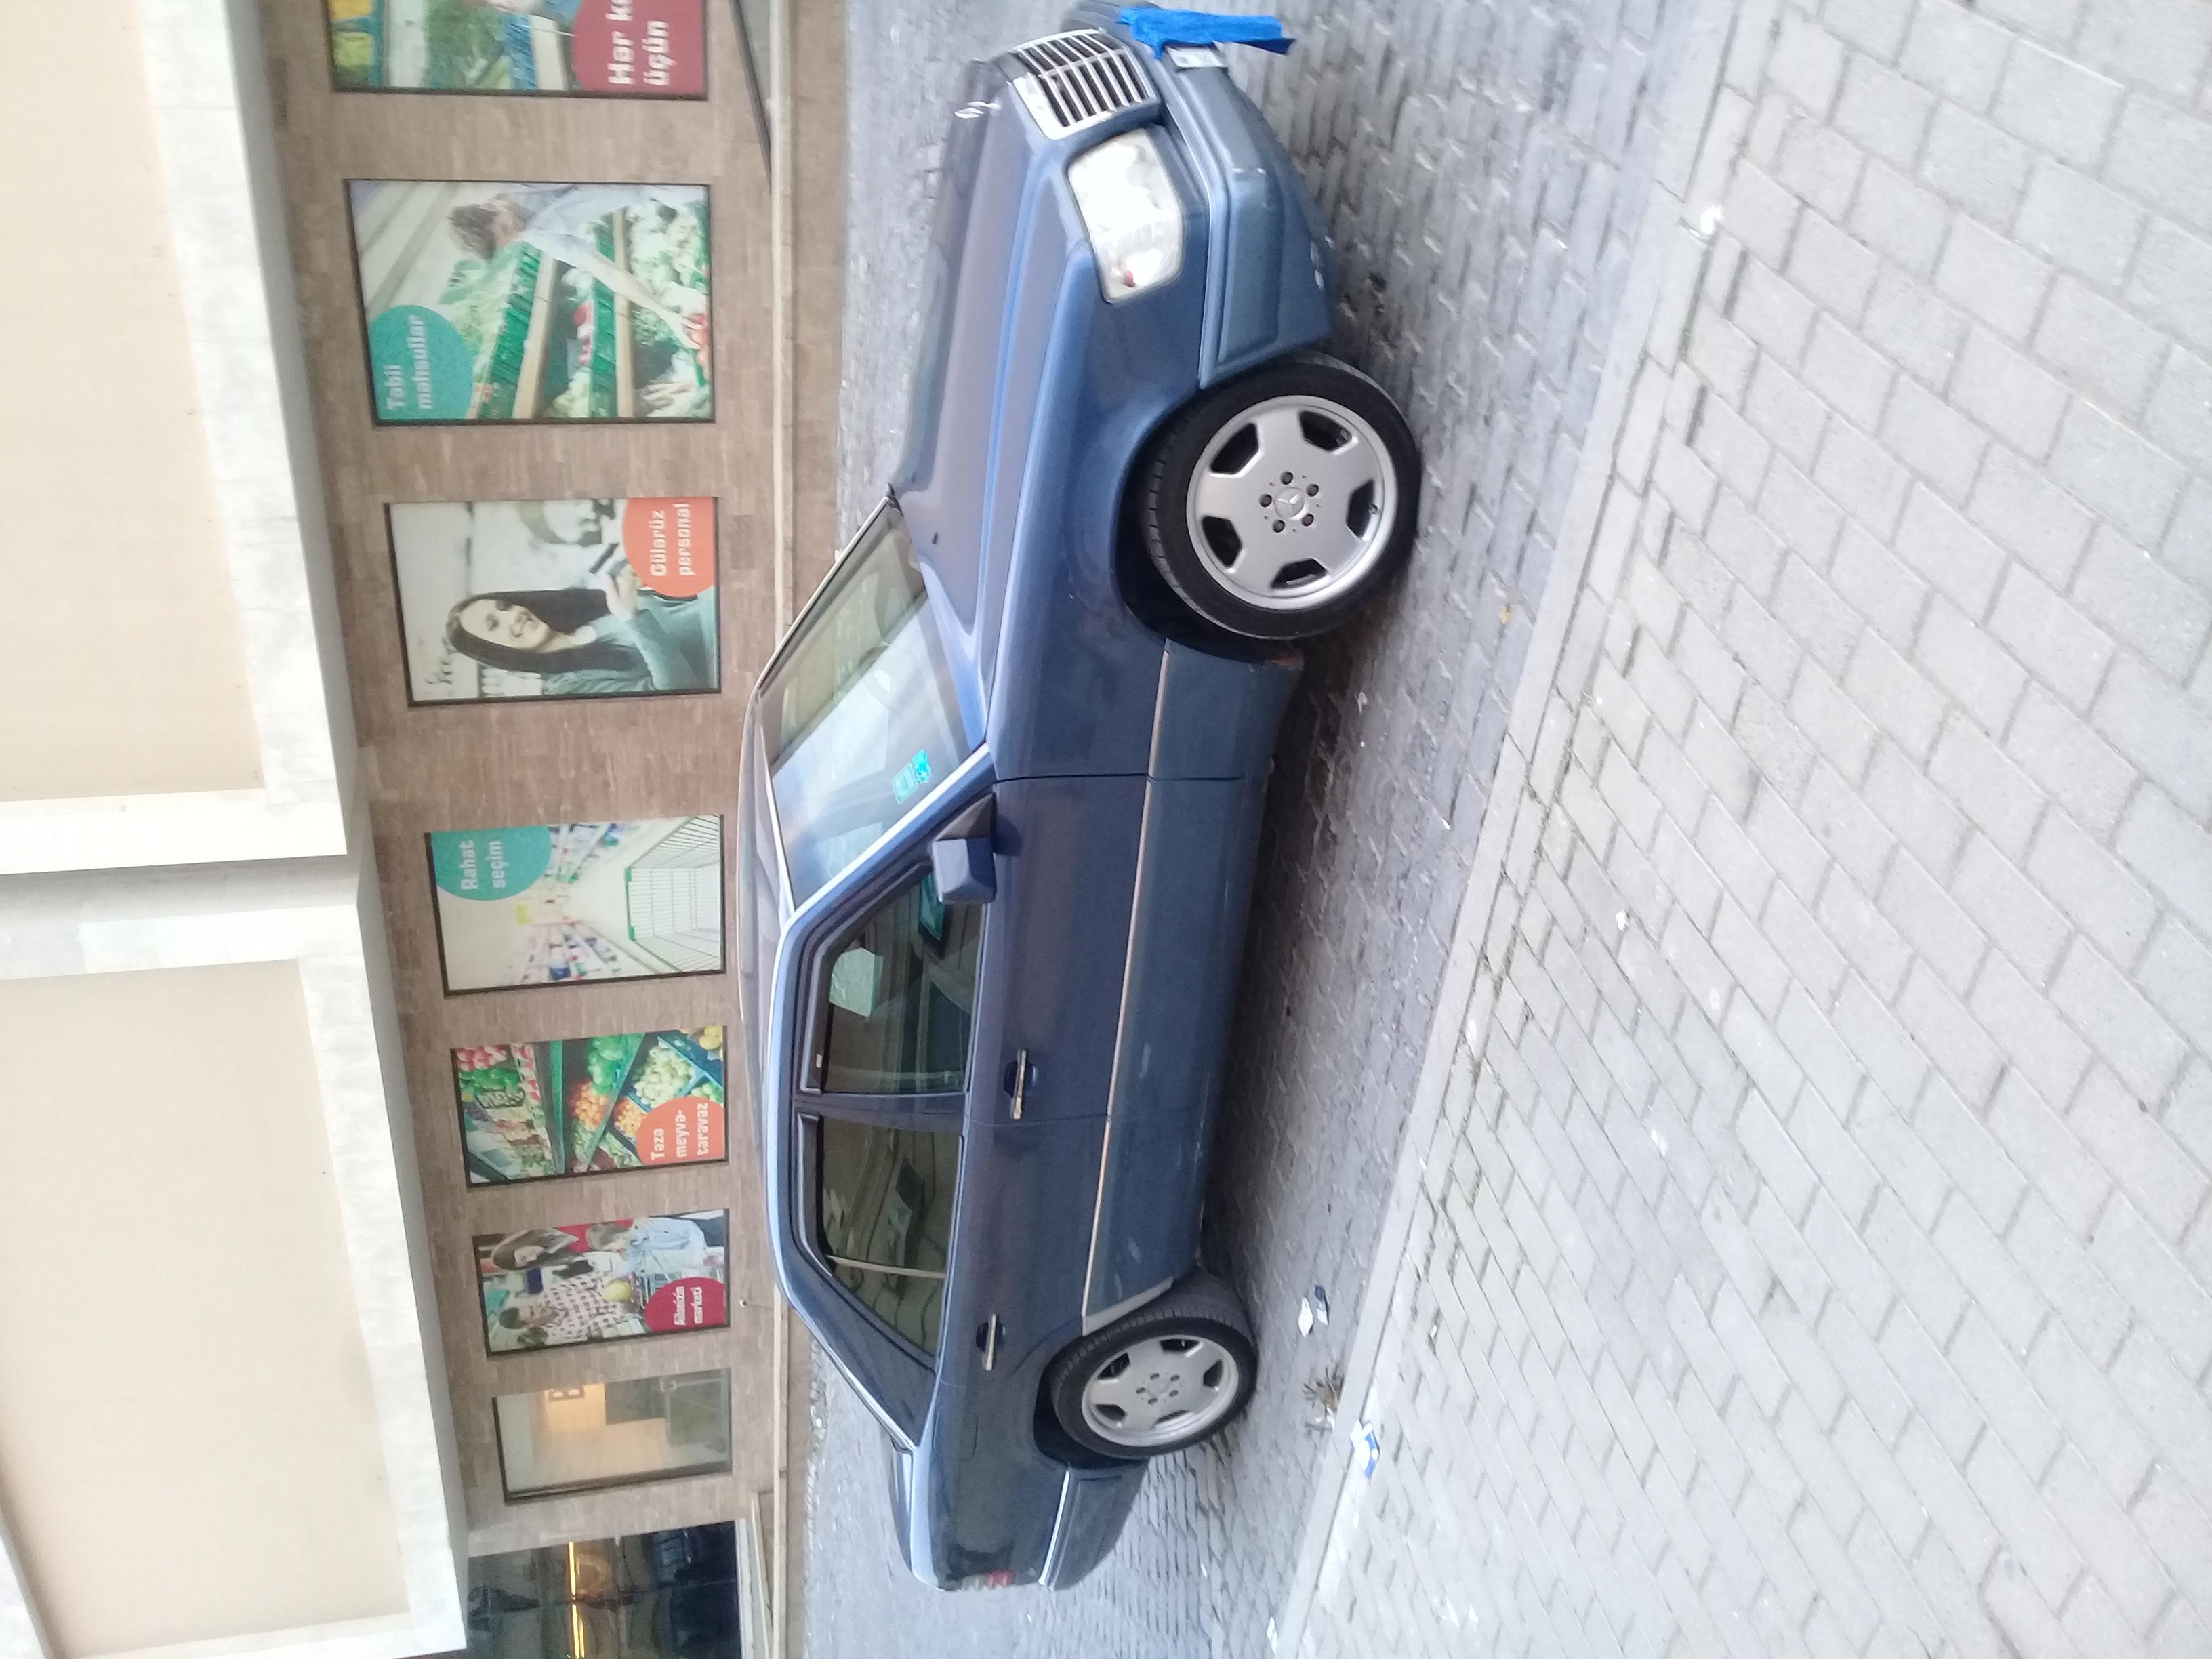 Mercedes-Benz 220 2.2(lt) 1993 İkinci əl  $8000